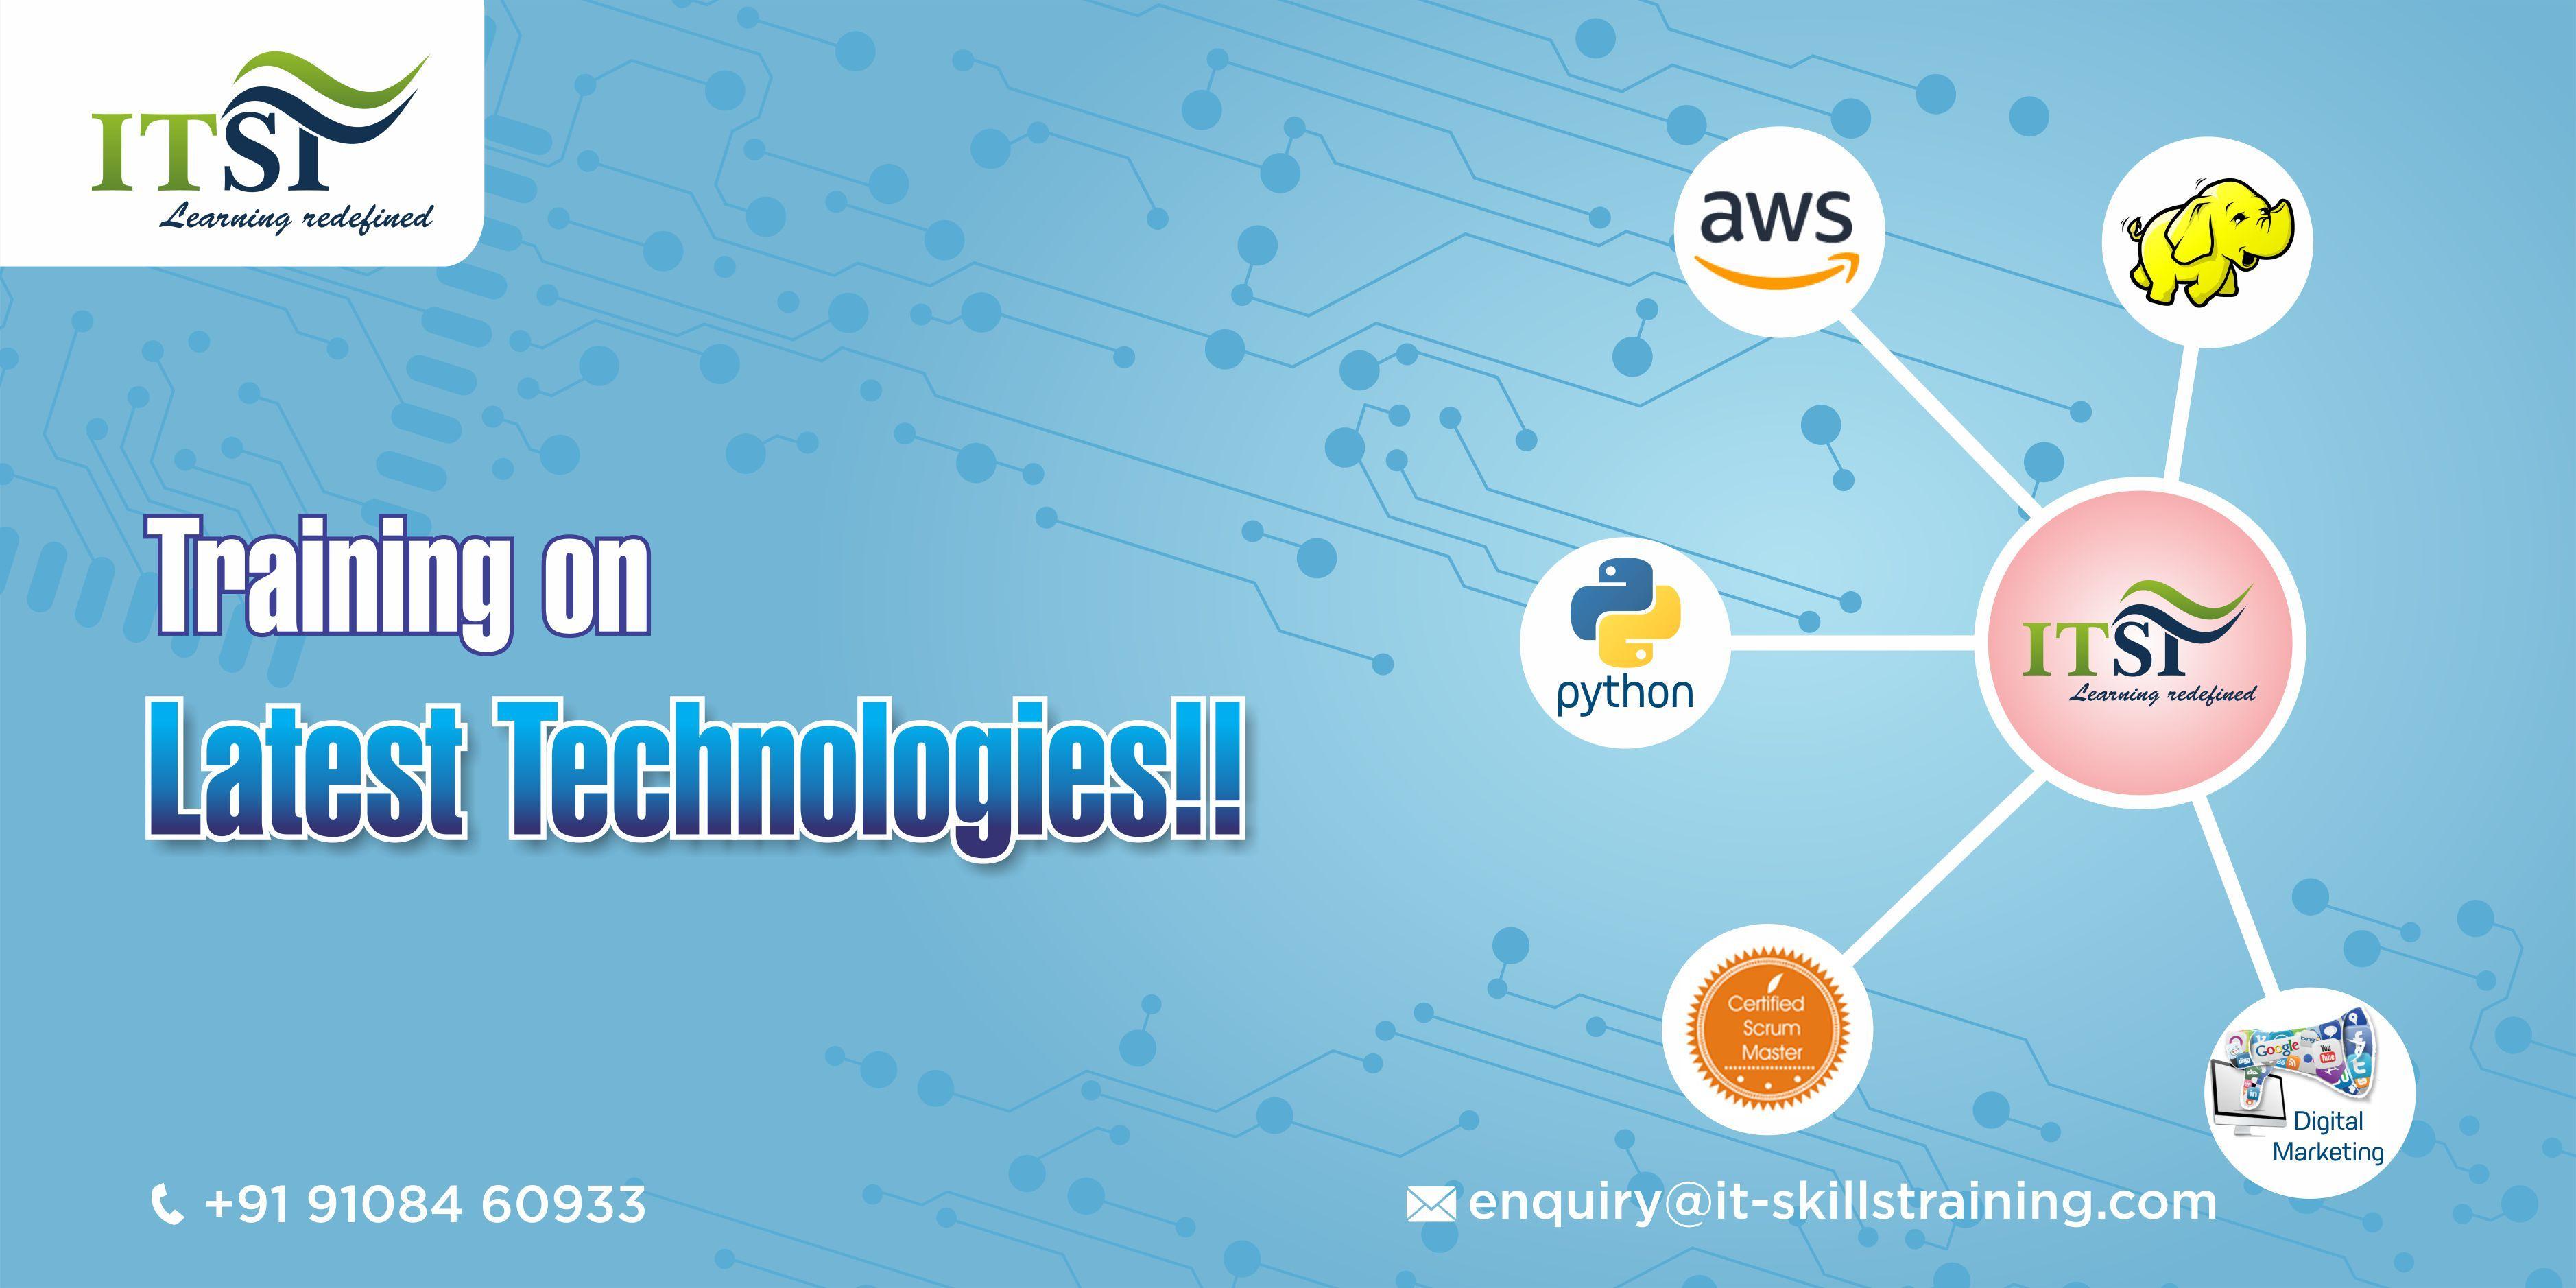 Get Training On Latest Technologies Join It Skills Training Itskilltraining Latesttechnologies Hadoop Dig Skill Training Digital Marketing Technology